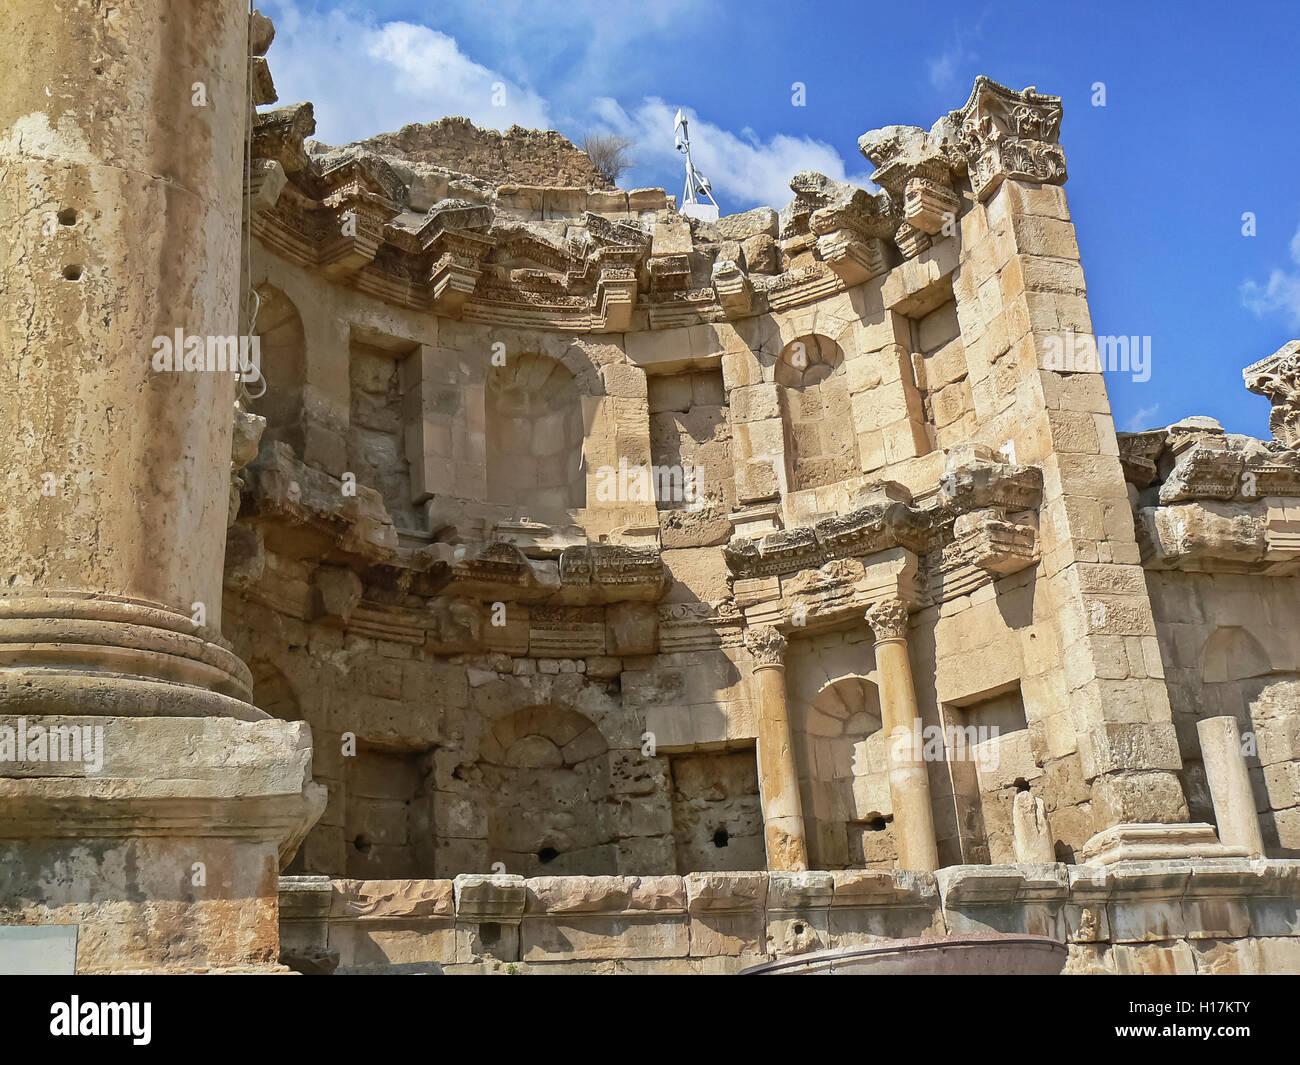 the Nymphaeum, Roman site at Jerash, Jordan - Stock Image